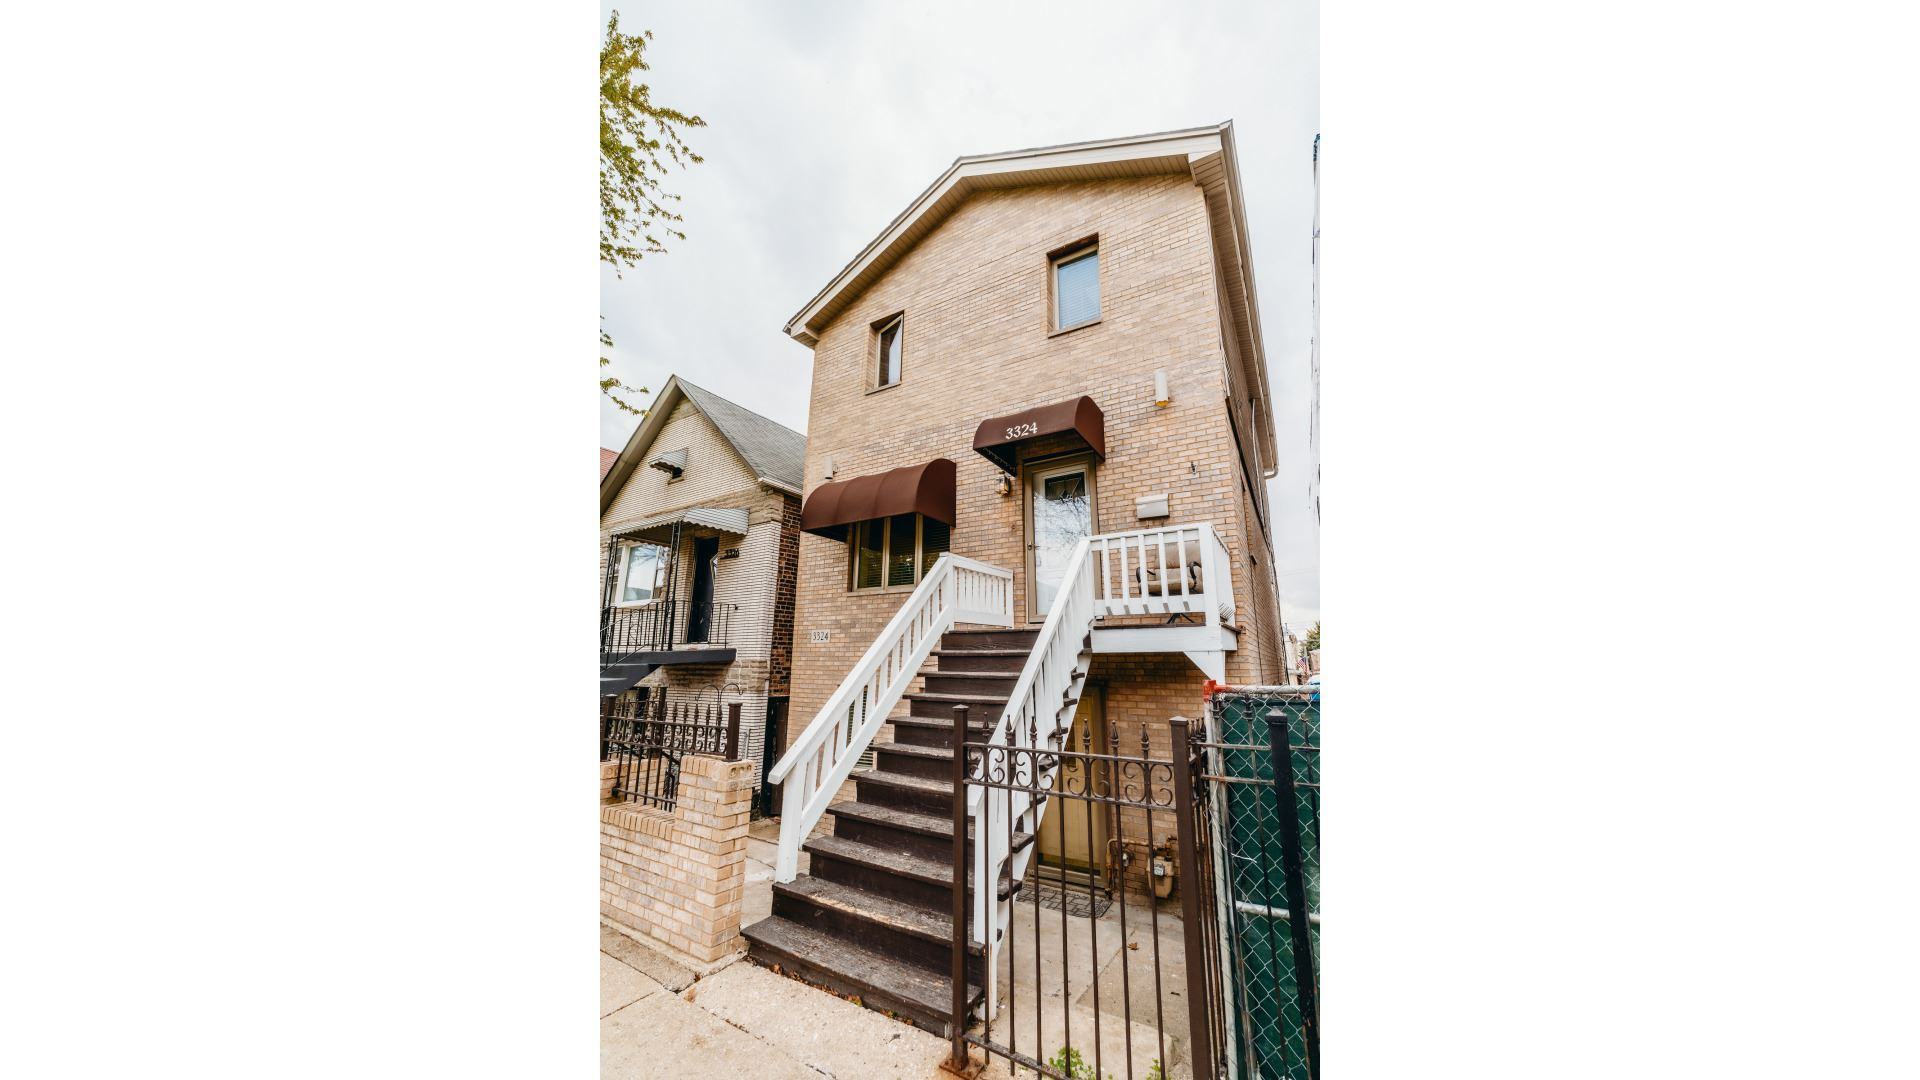 3324 S Carpenter Street, Chicago, IL 60608 - #: 11063056